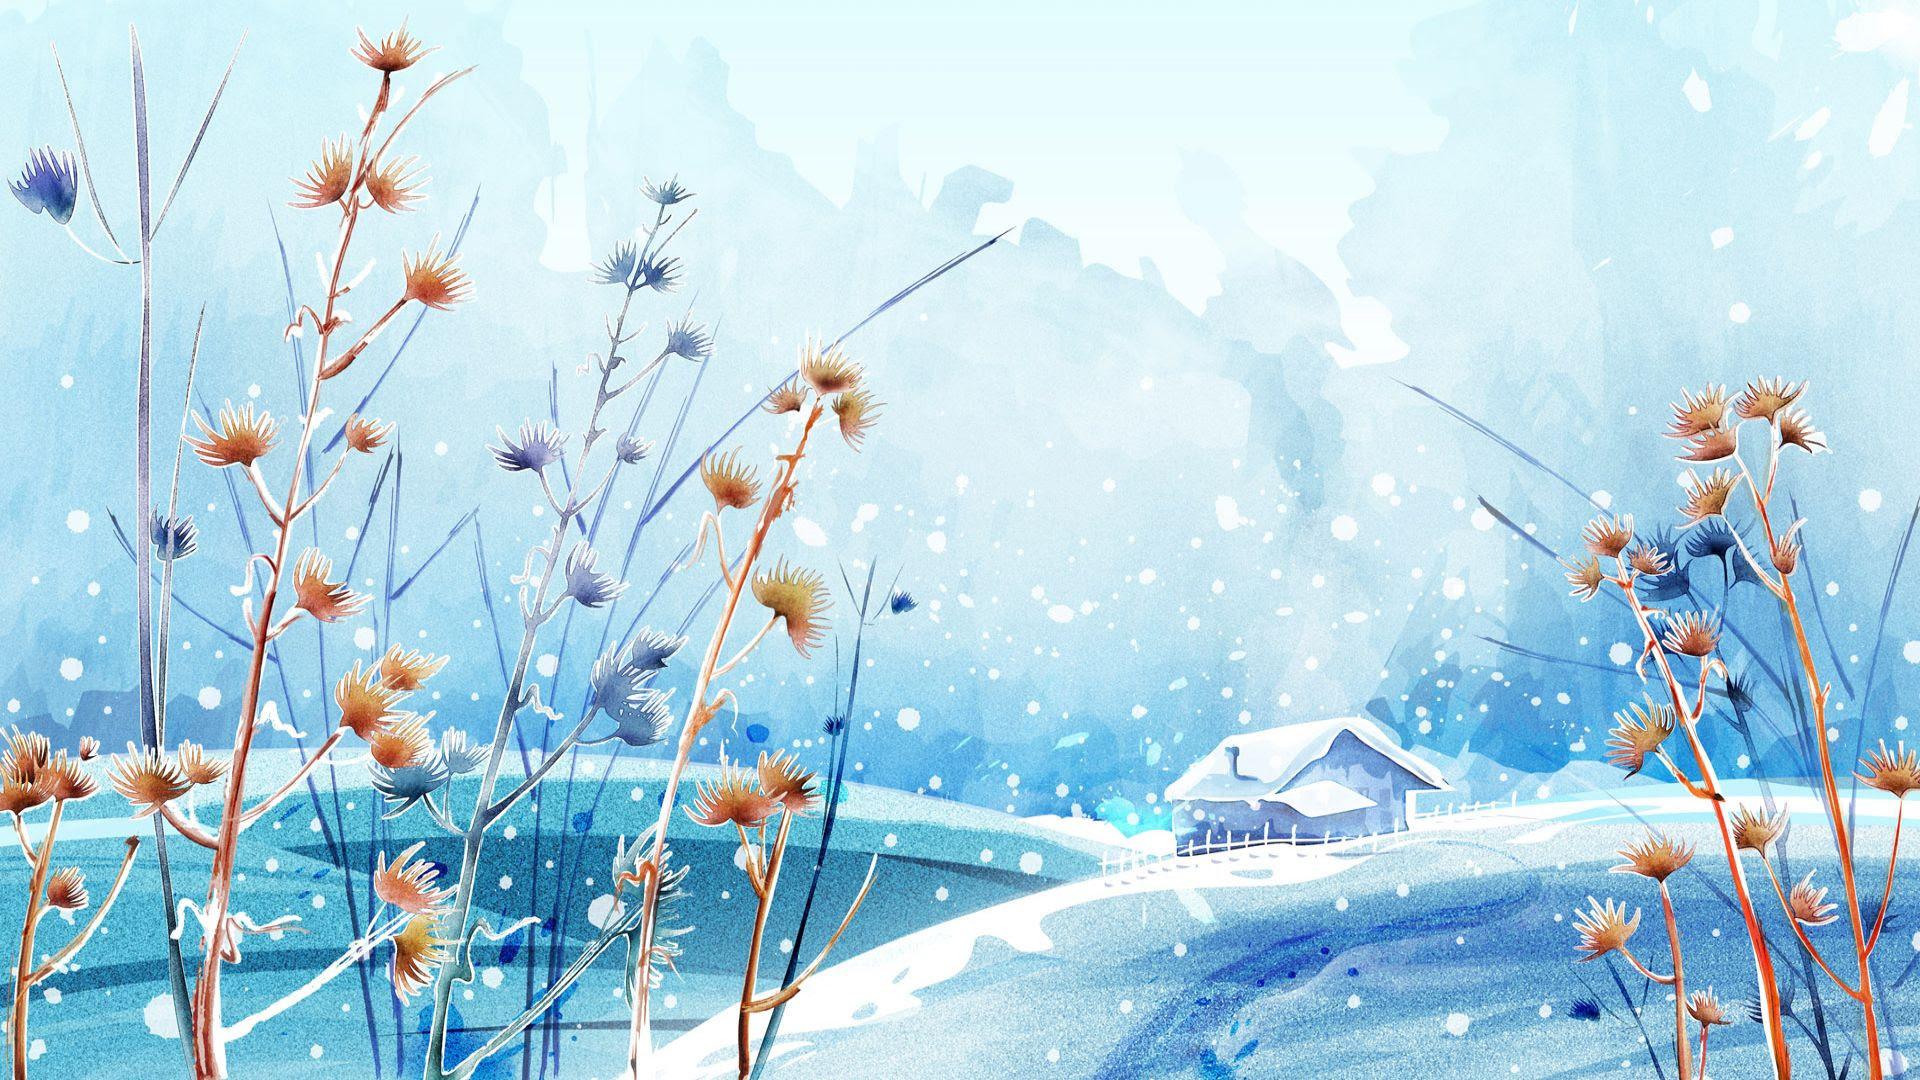 Beautiful Winter Wallpapers for Desktop 49+ images